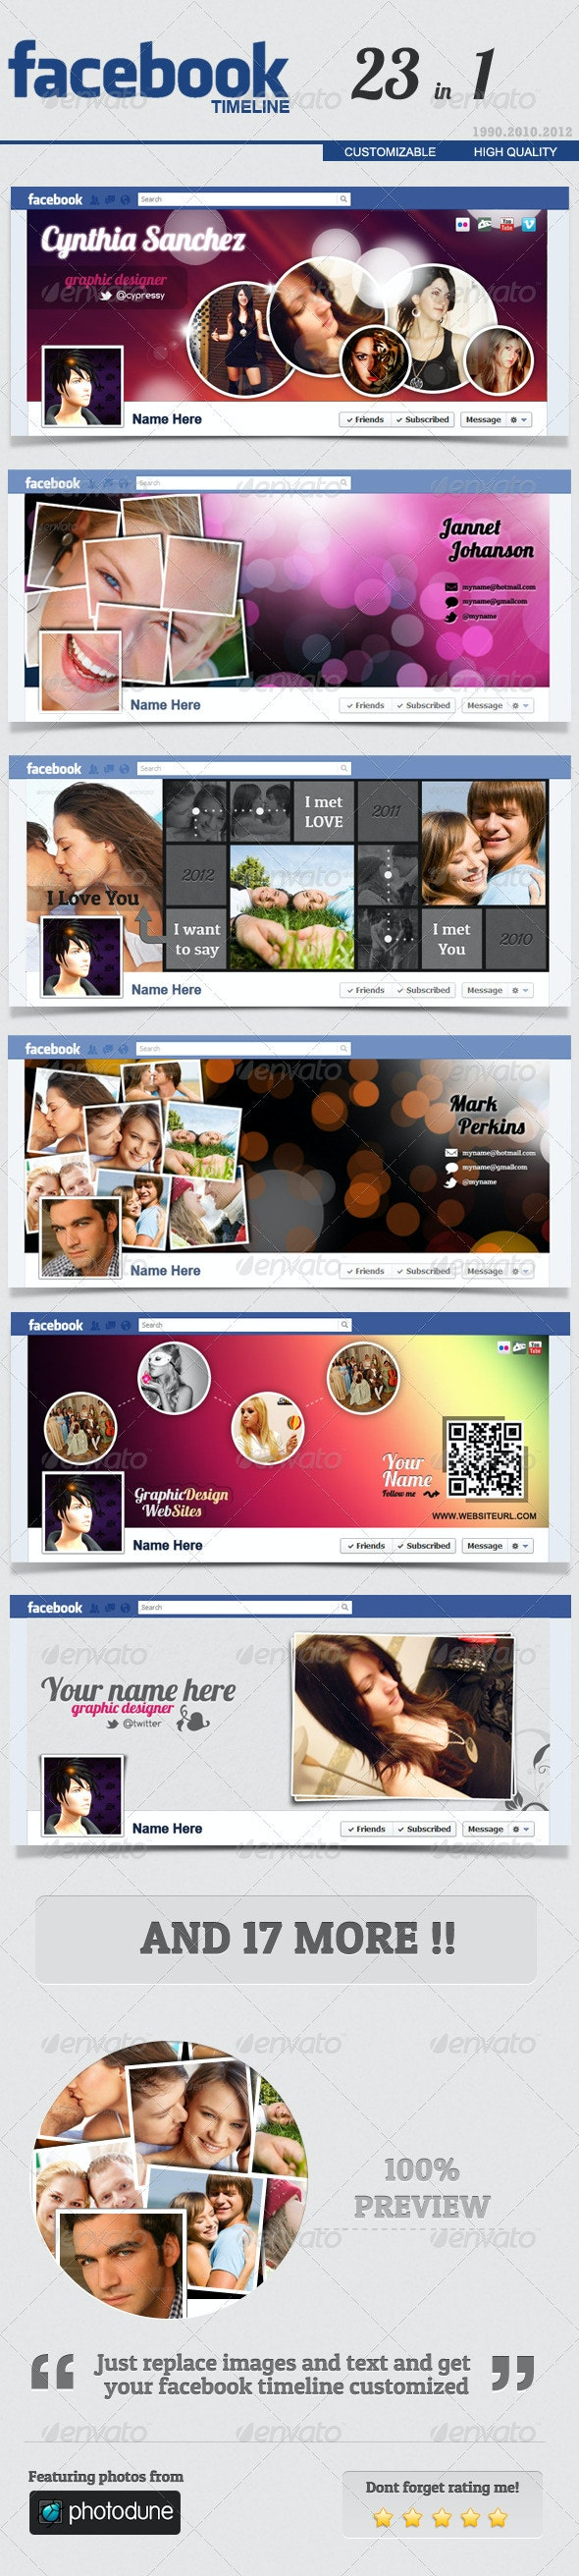 Facebook Timeline Cover FULL 23 in 1 - Facebook Timeline Covers Social Media